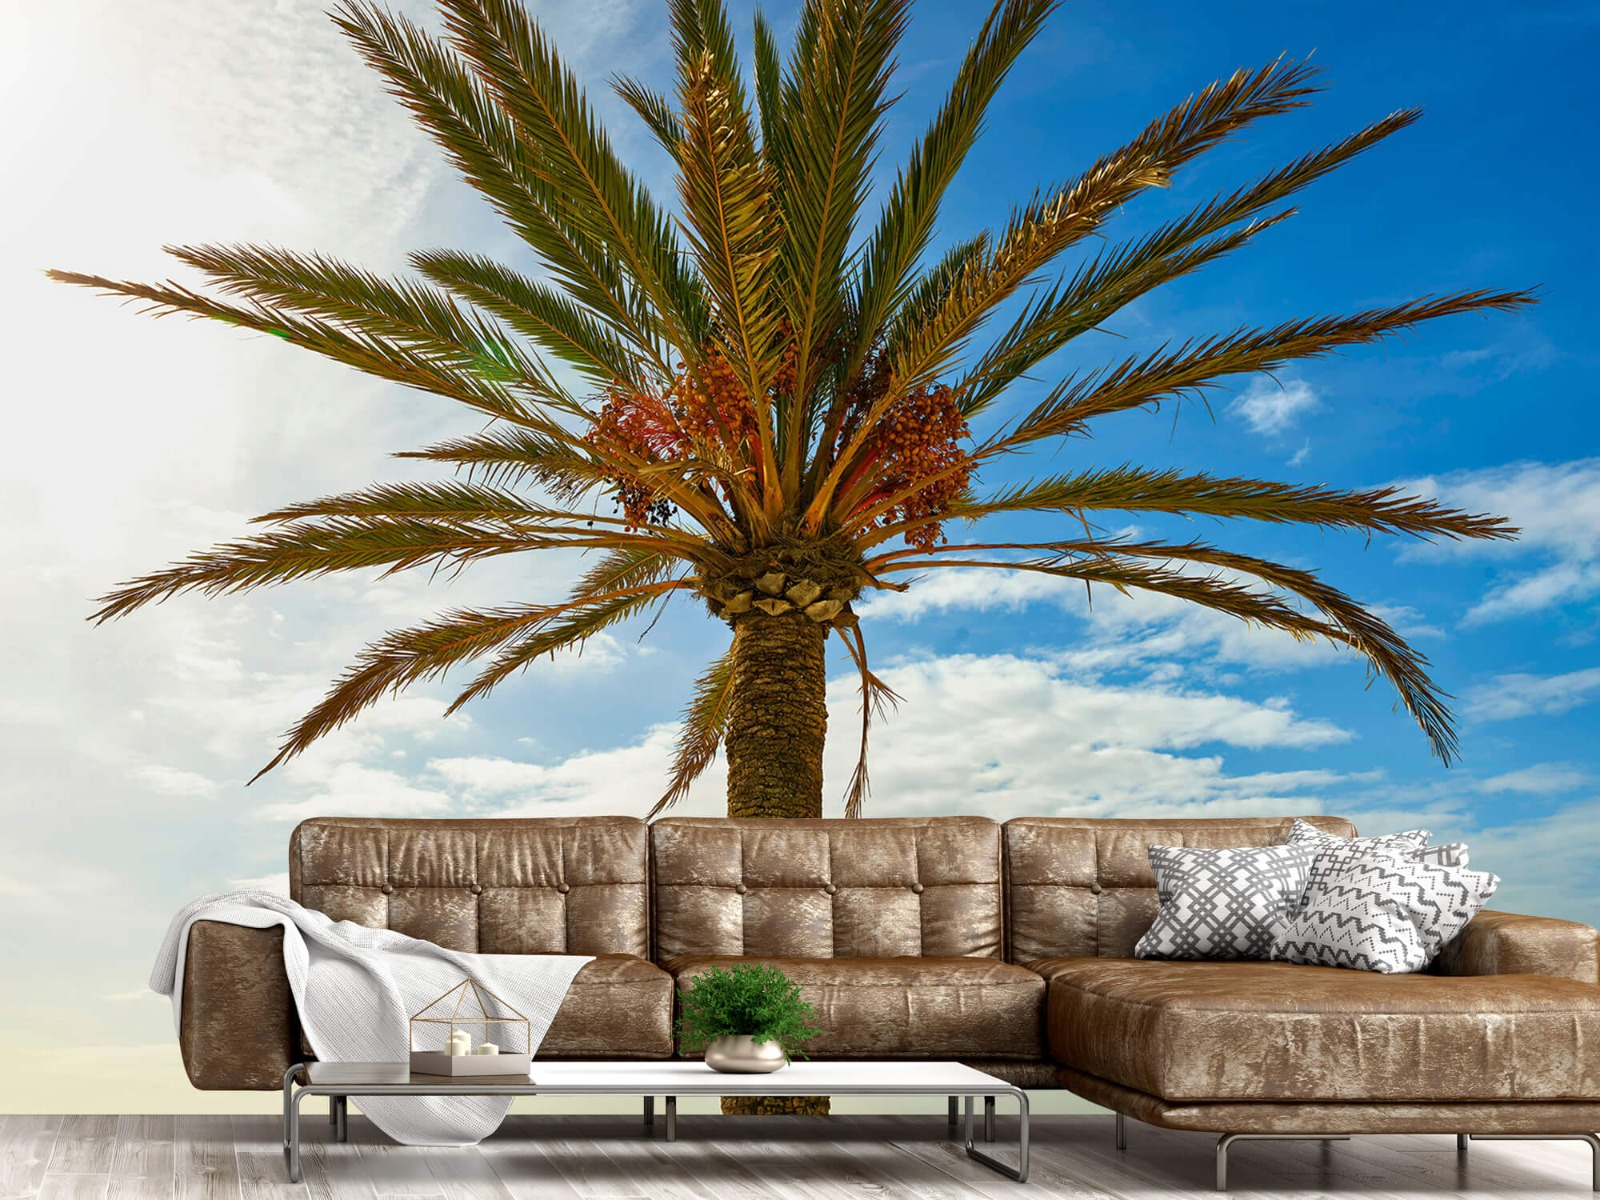 Palmbomen - Mooie palmboom - Keuken 14